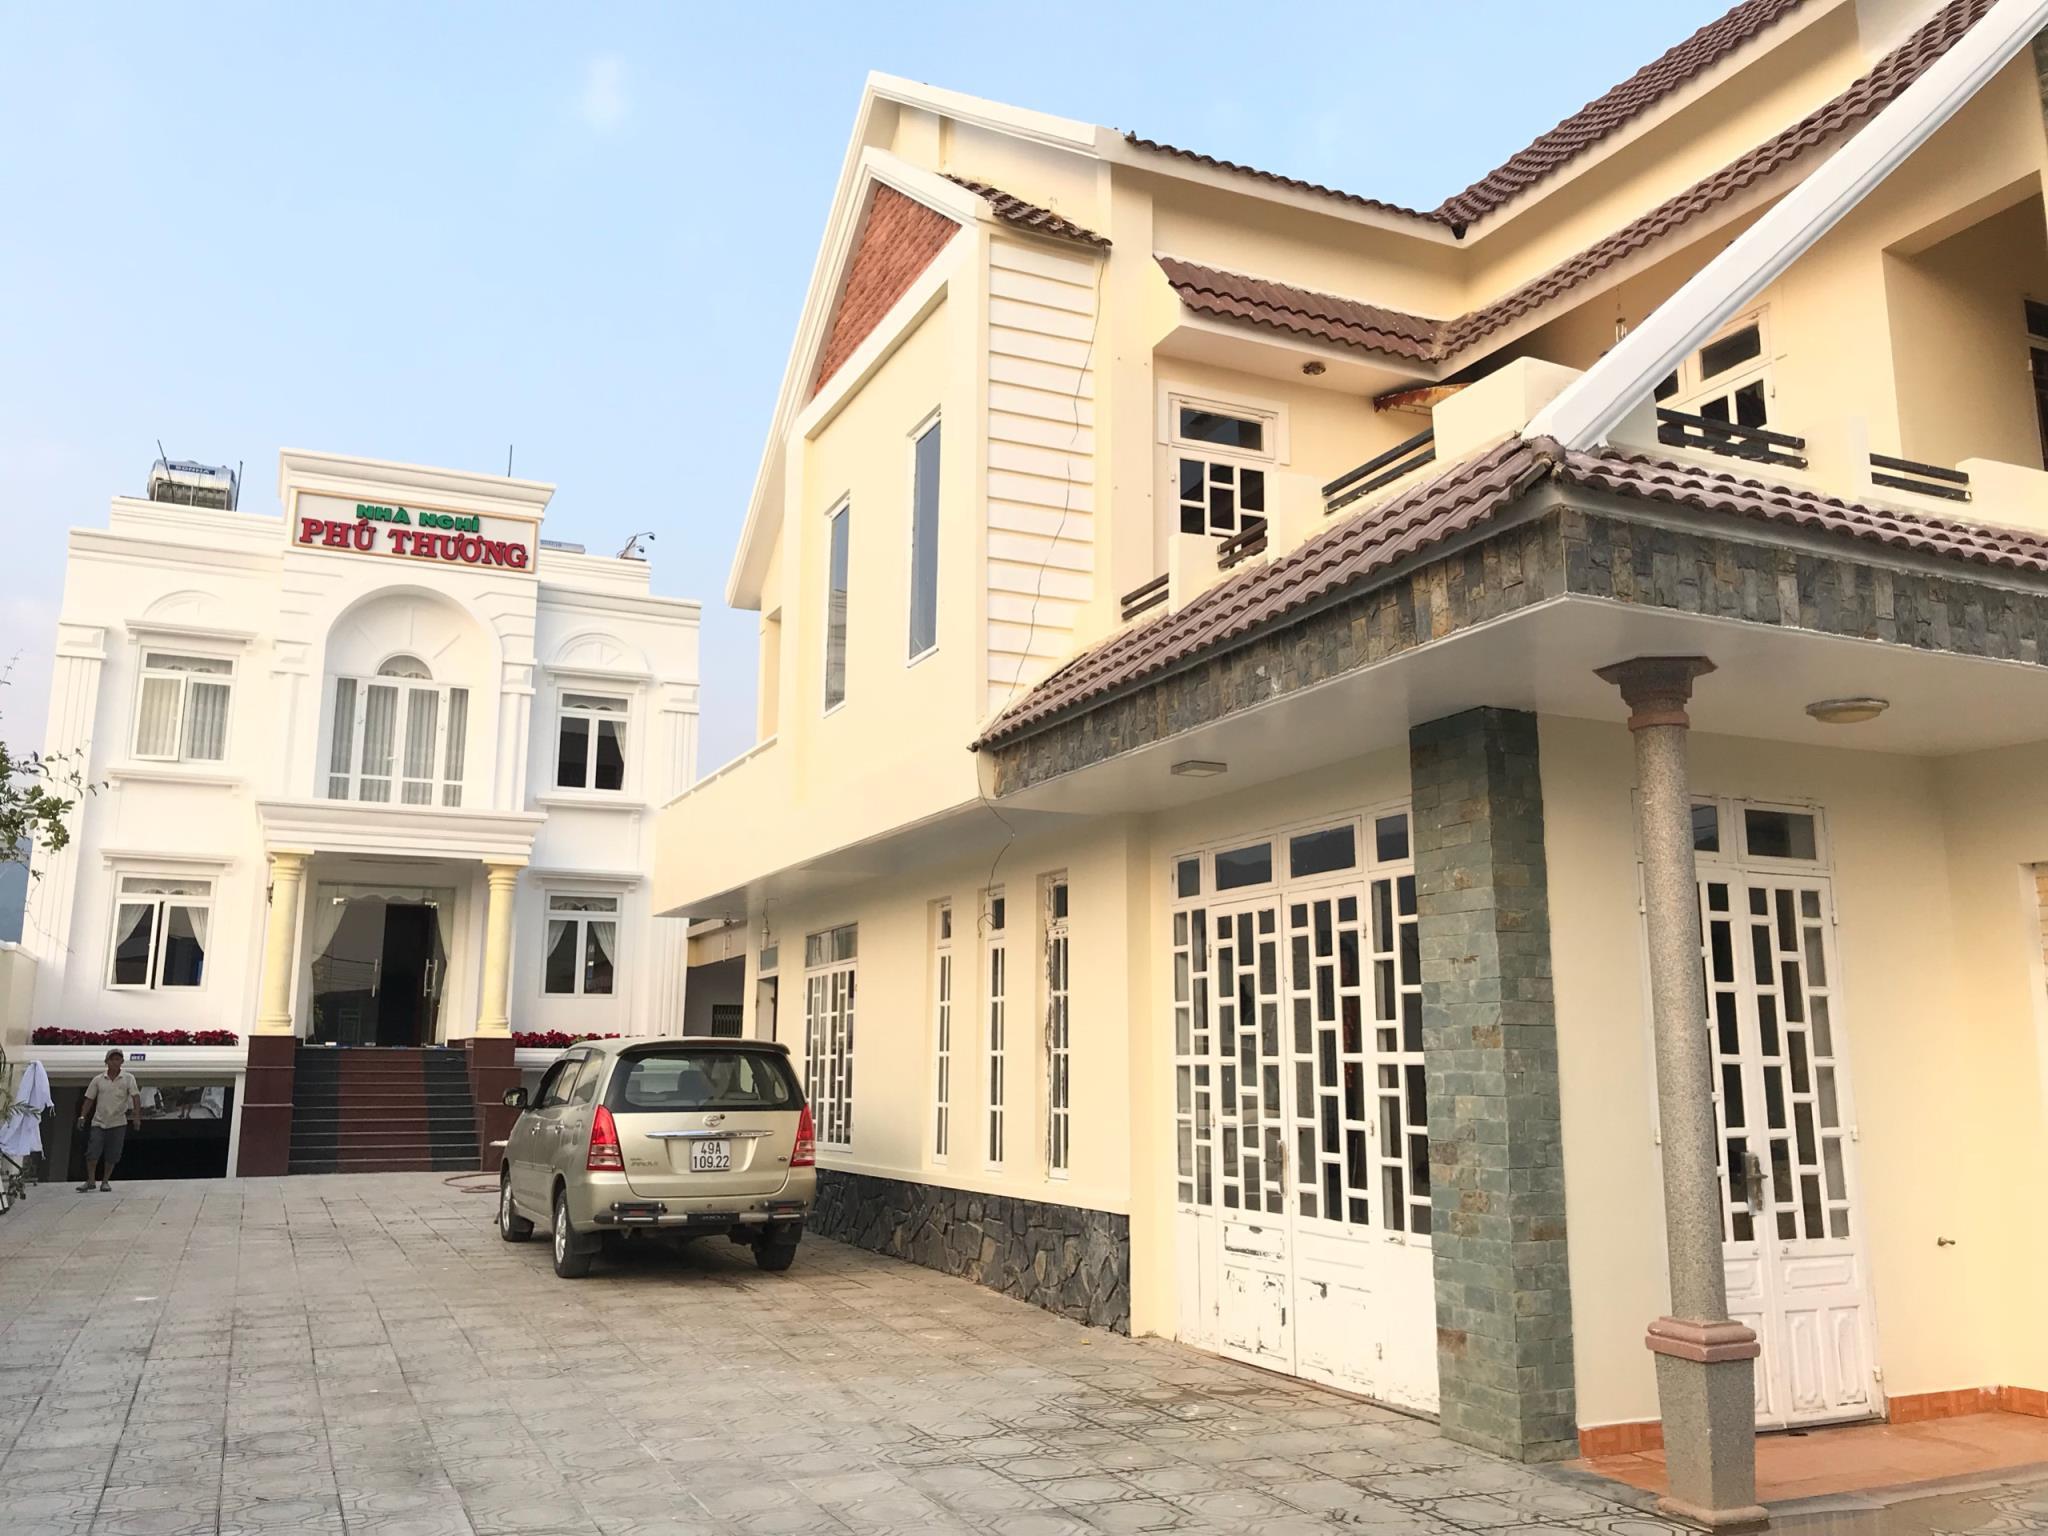 Nha Nghi Phu Thuong